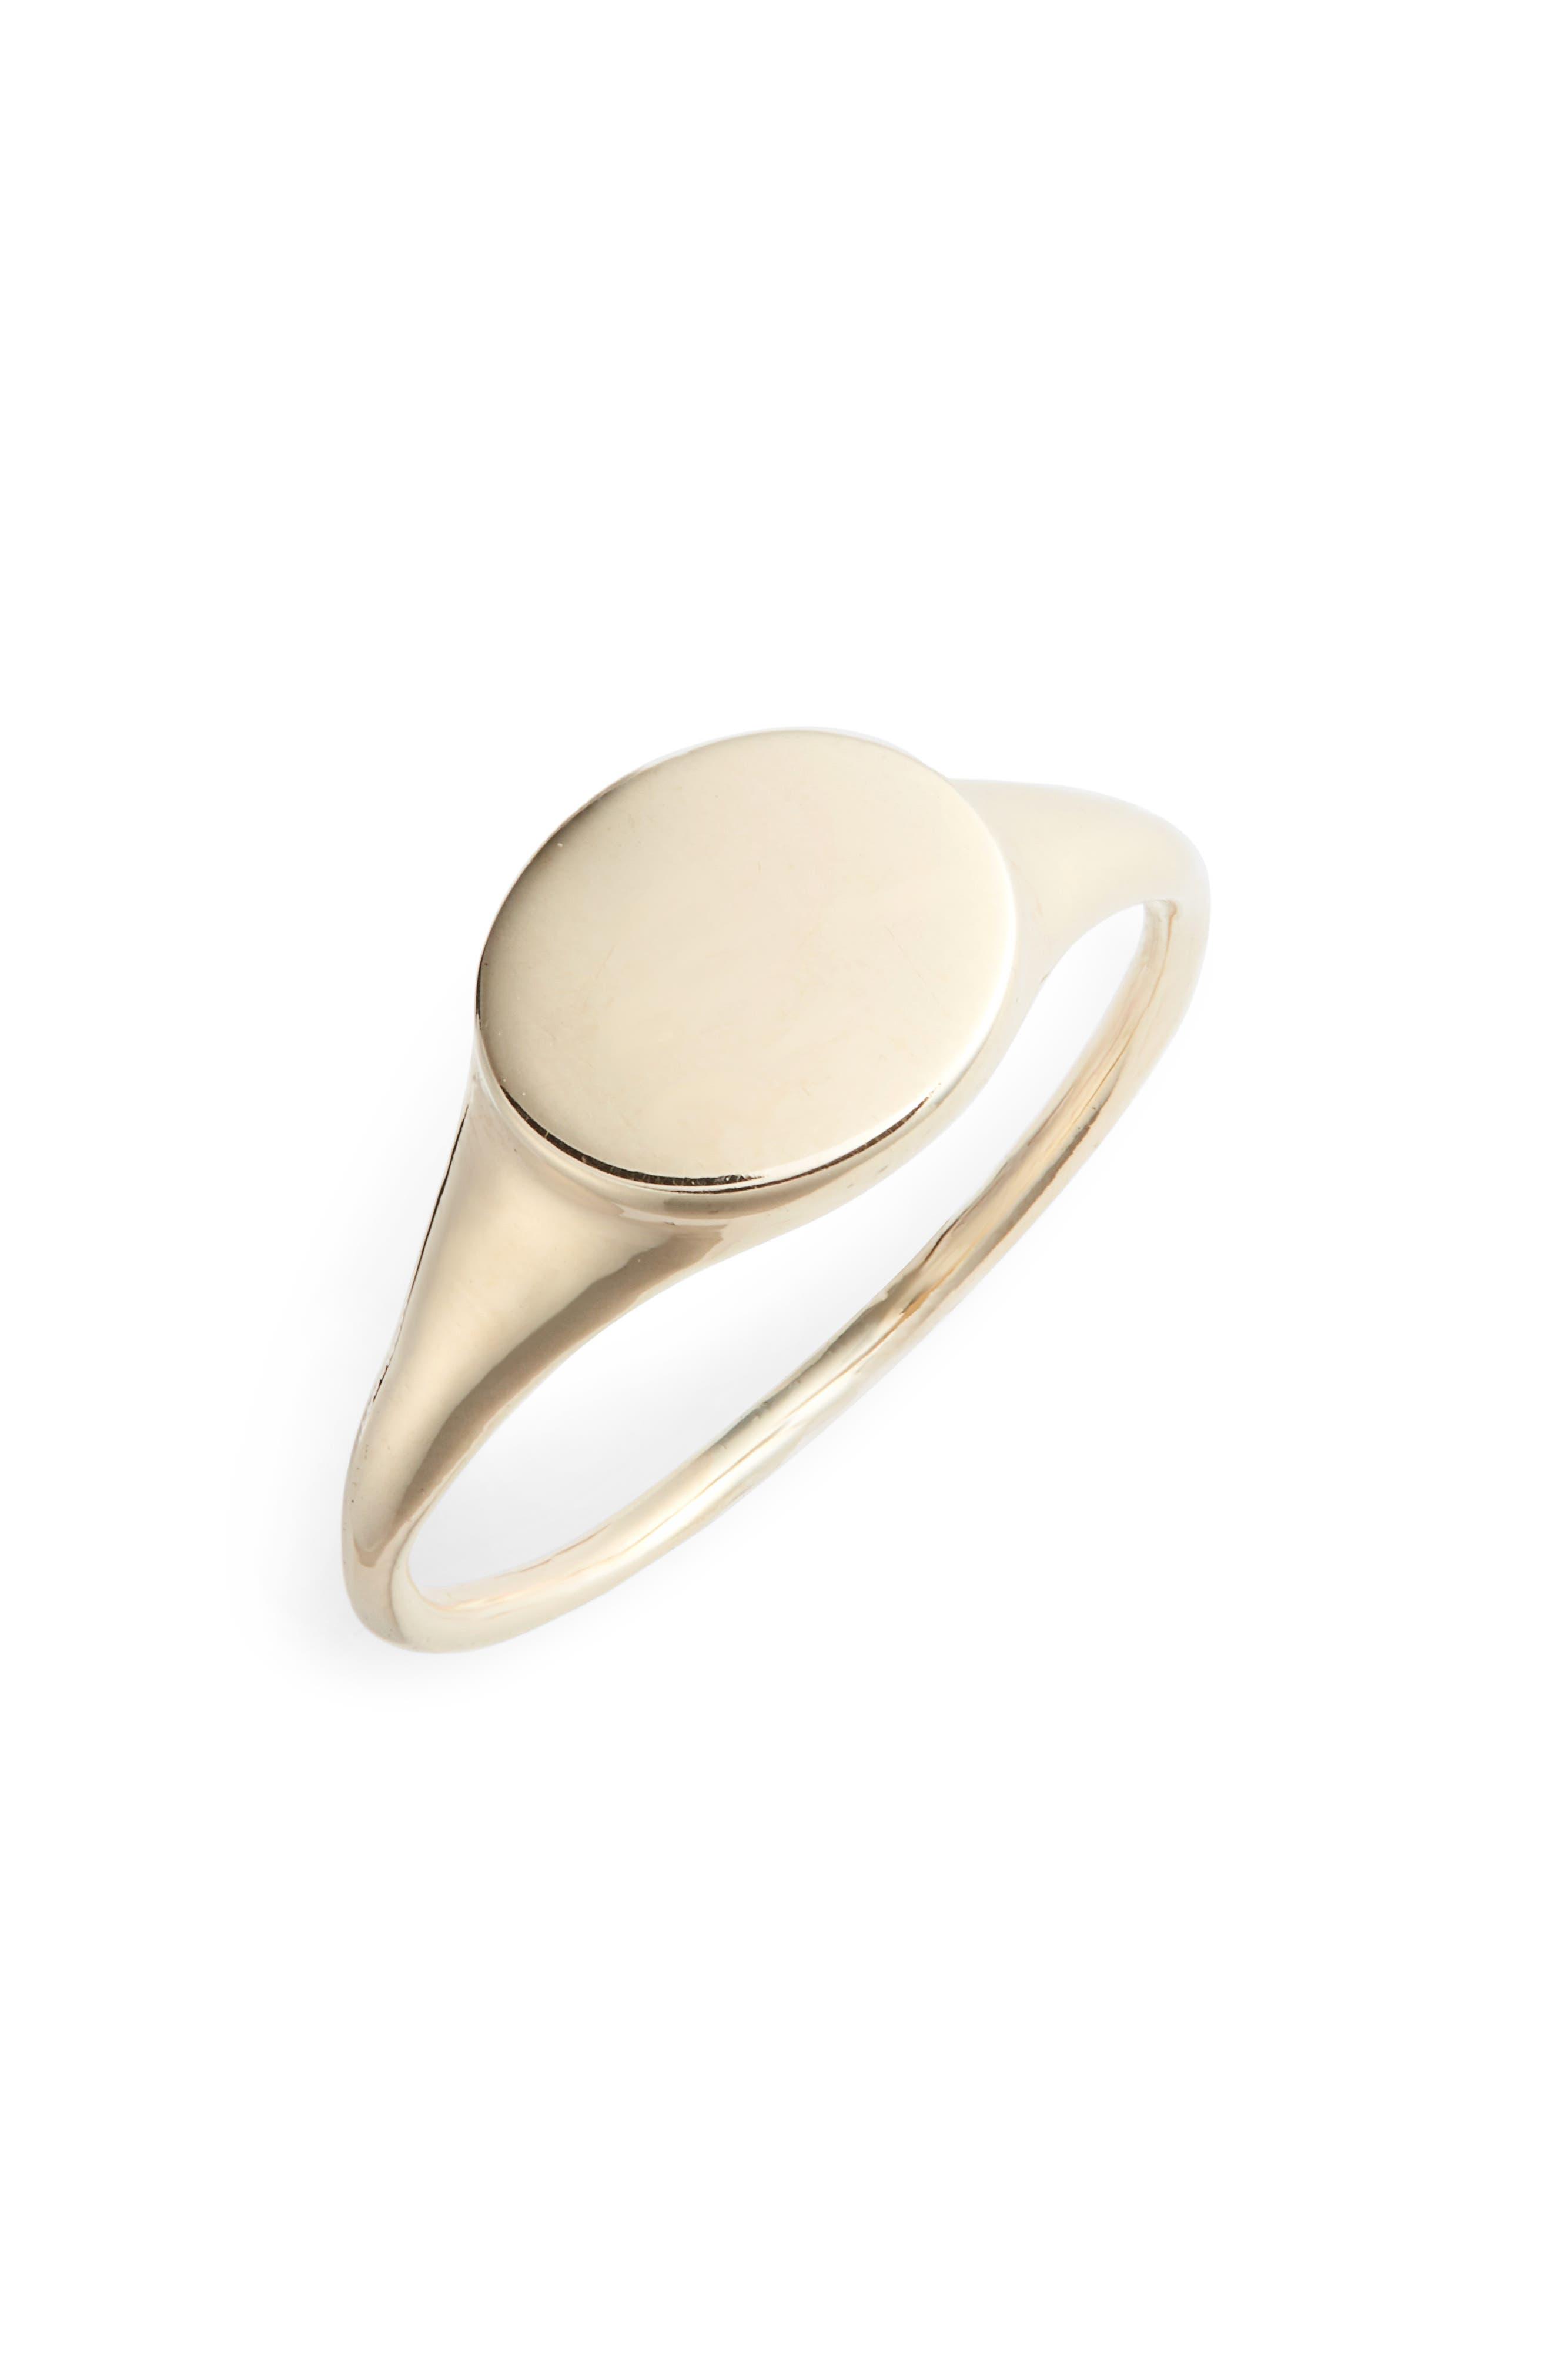 Flat Oval Ring,                             Main thumbnail 1, color,                             GOLD